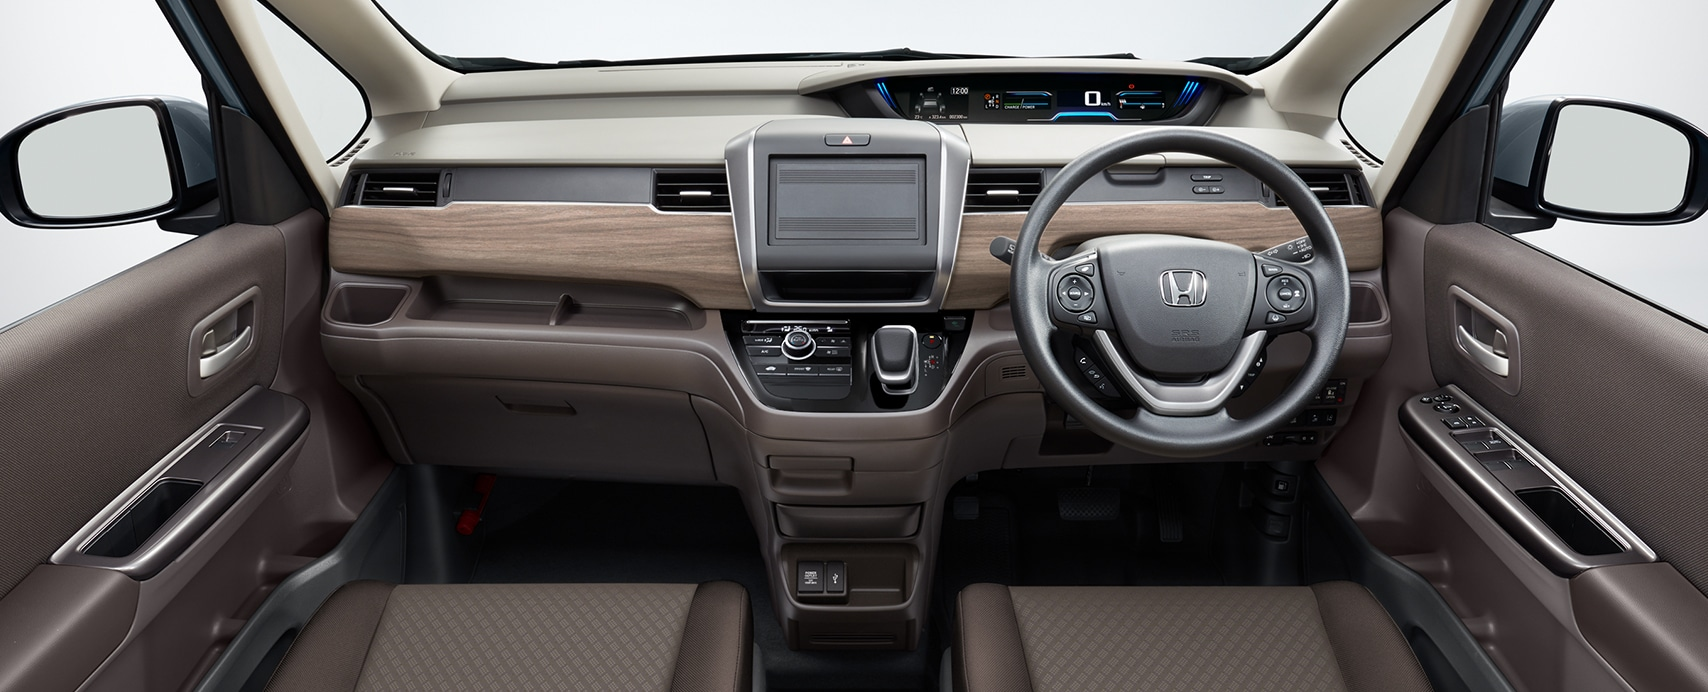 Honda SENSINGも全社標準装備!ホンダのコンパクトミニバン「FREED」「FREED+」がマイナーチェンジ